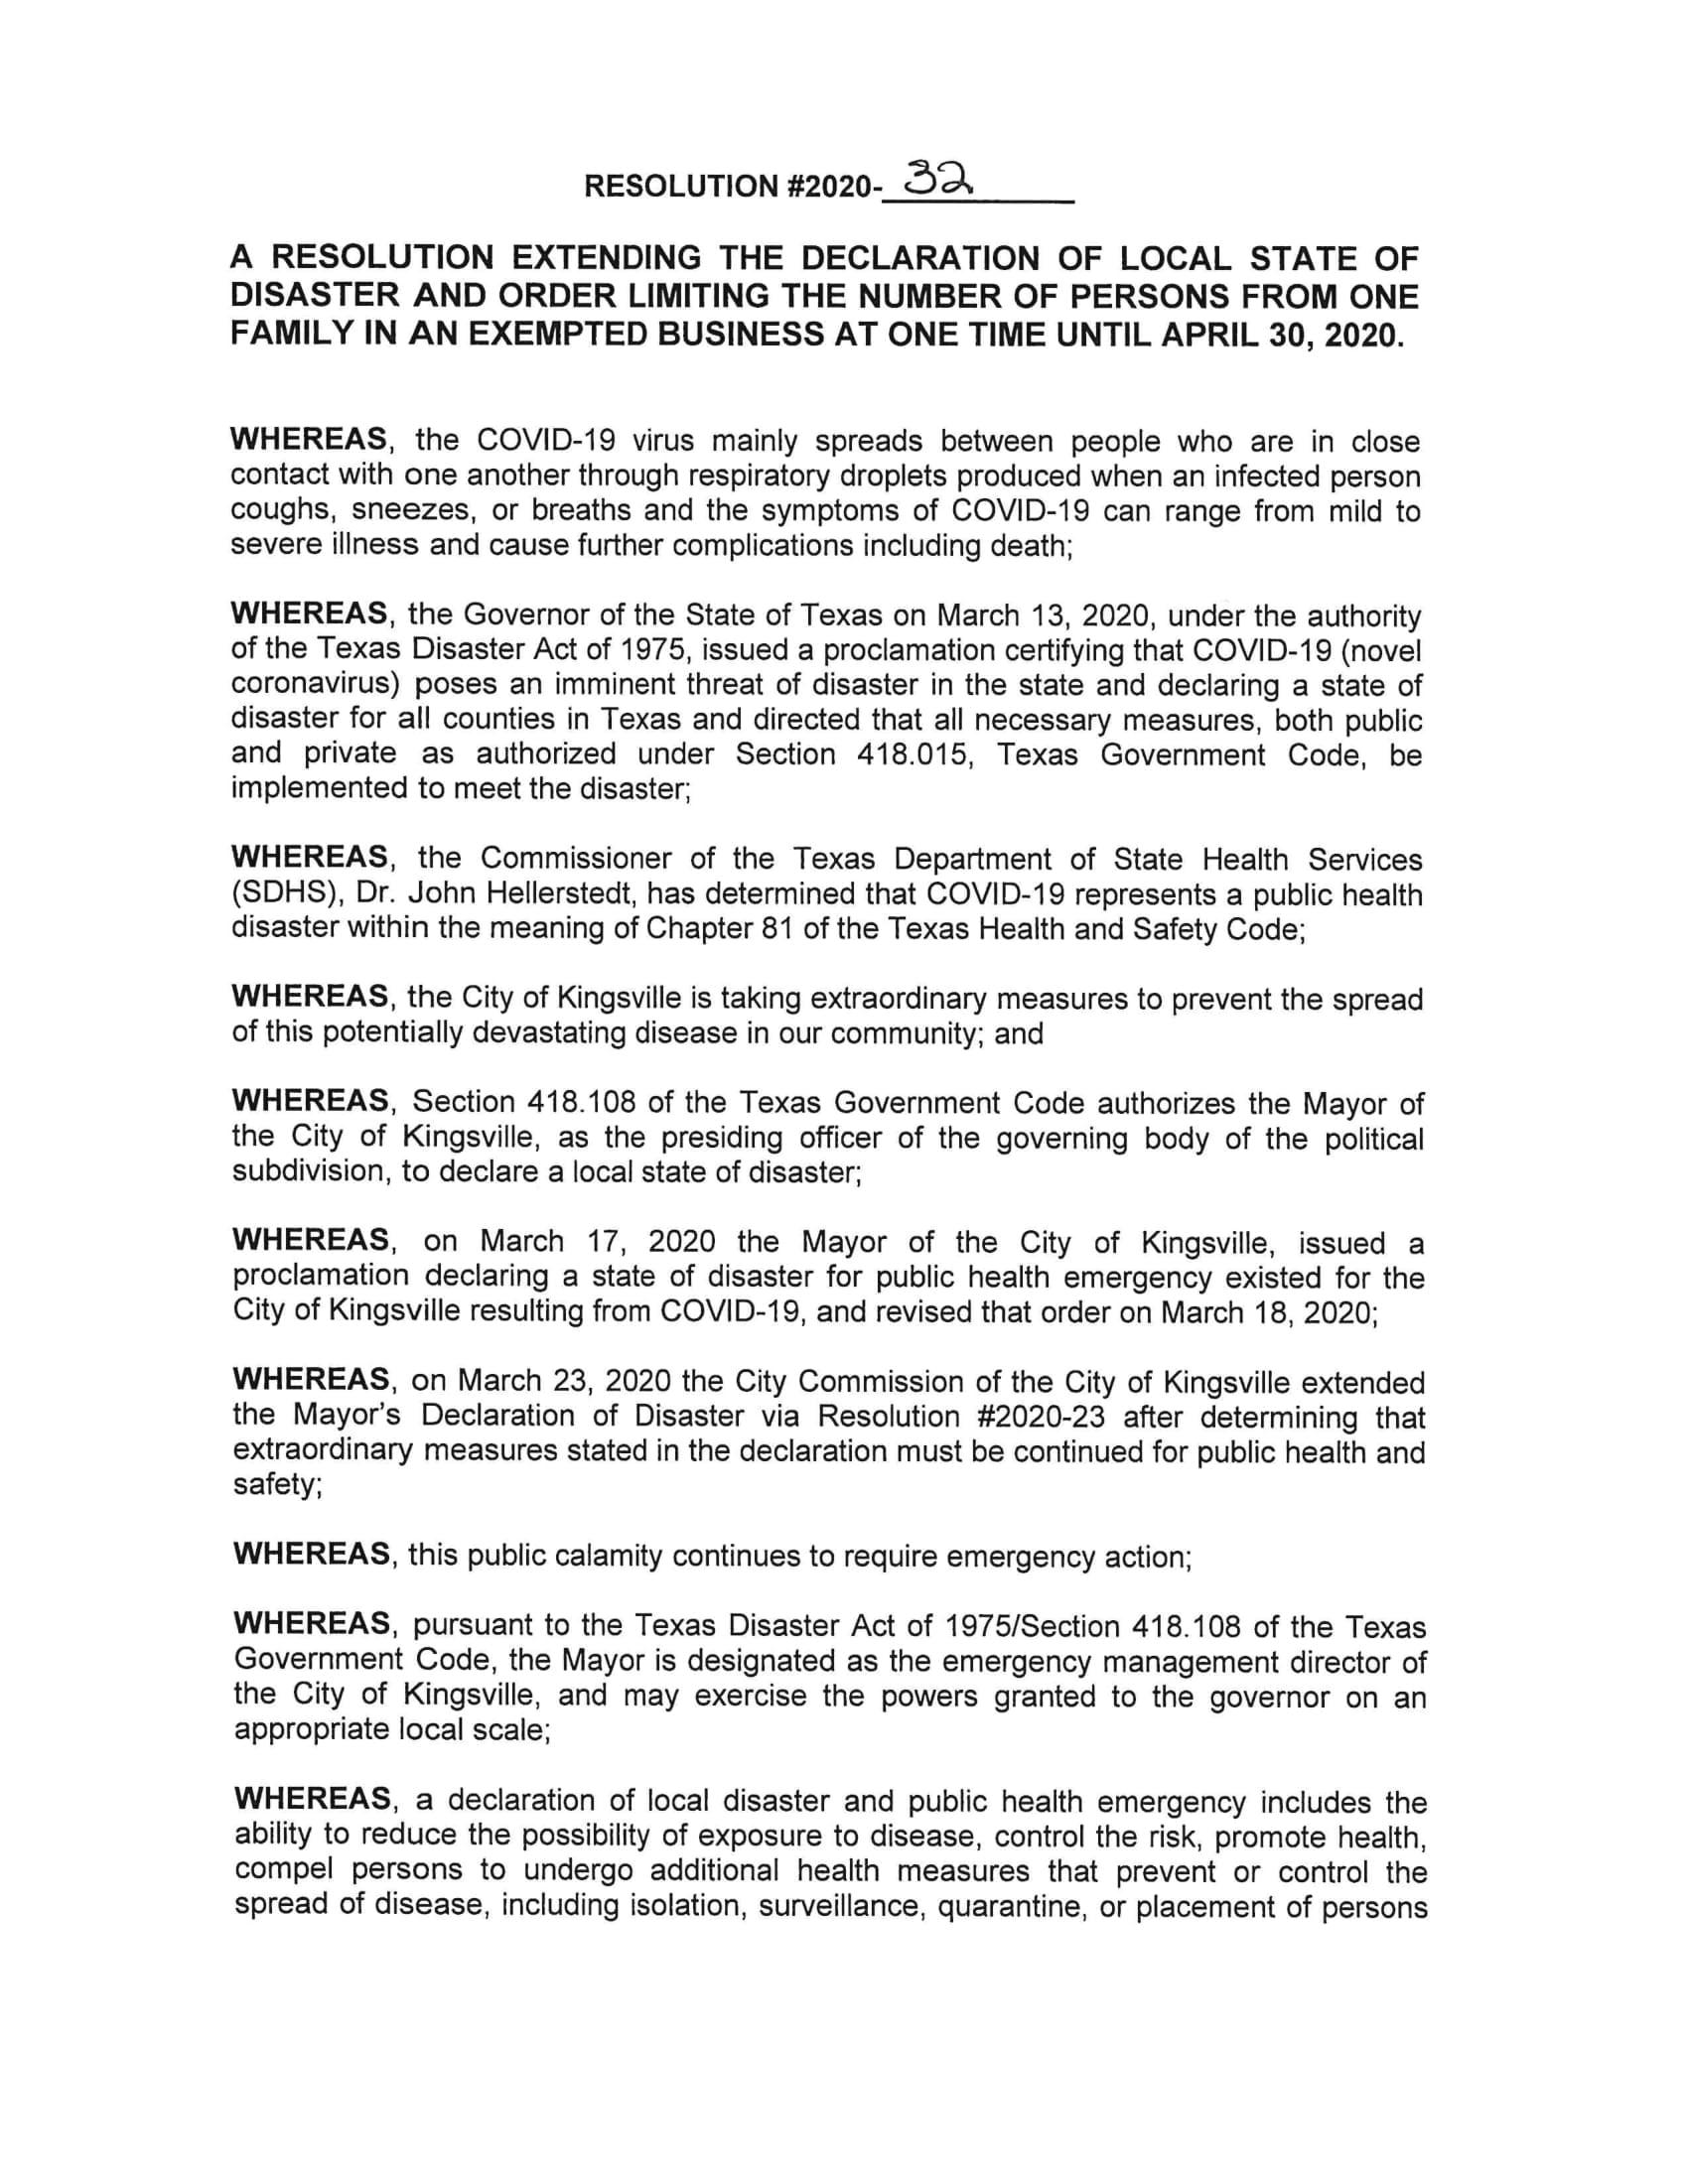 Resolution No. 2020-32-1